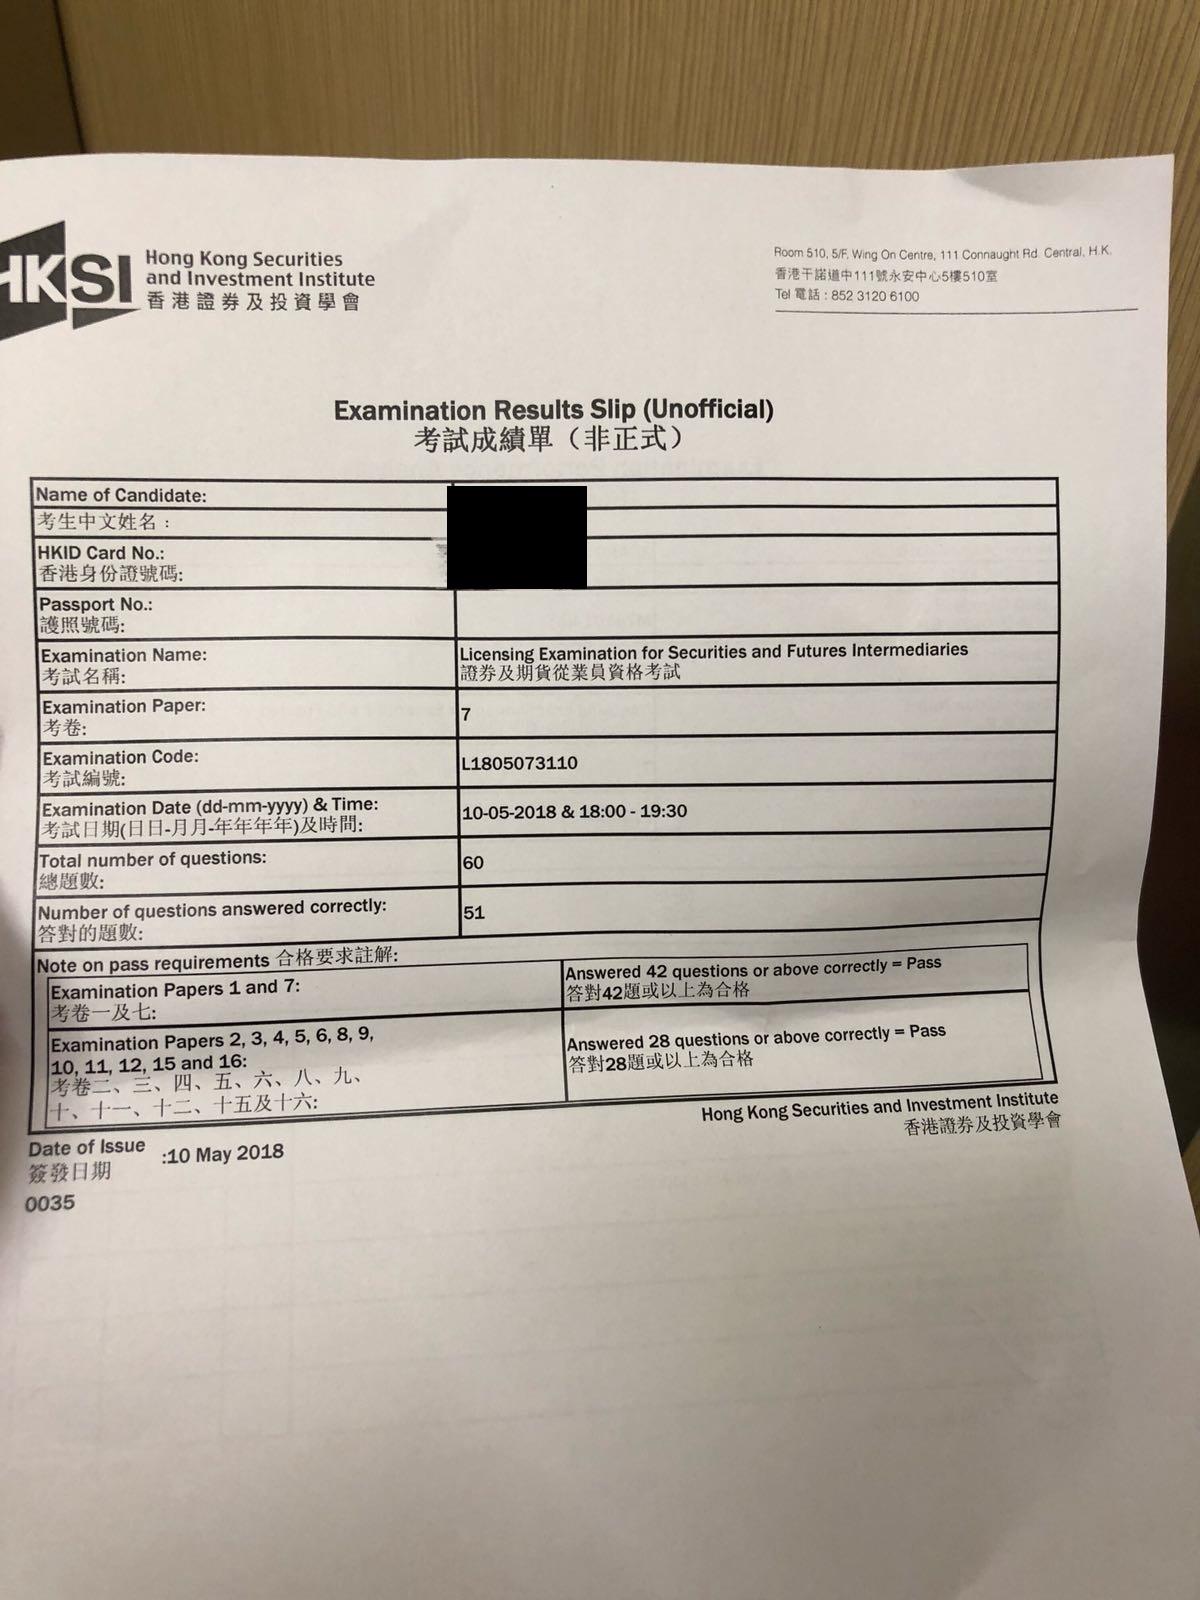 SSZ 11/5/2018 LE Paper 7 證券期貨從業員資格考試卷七 Pass